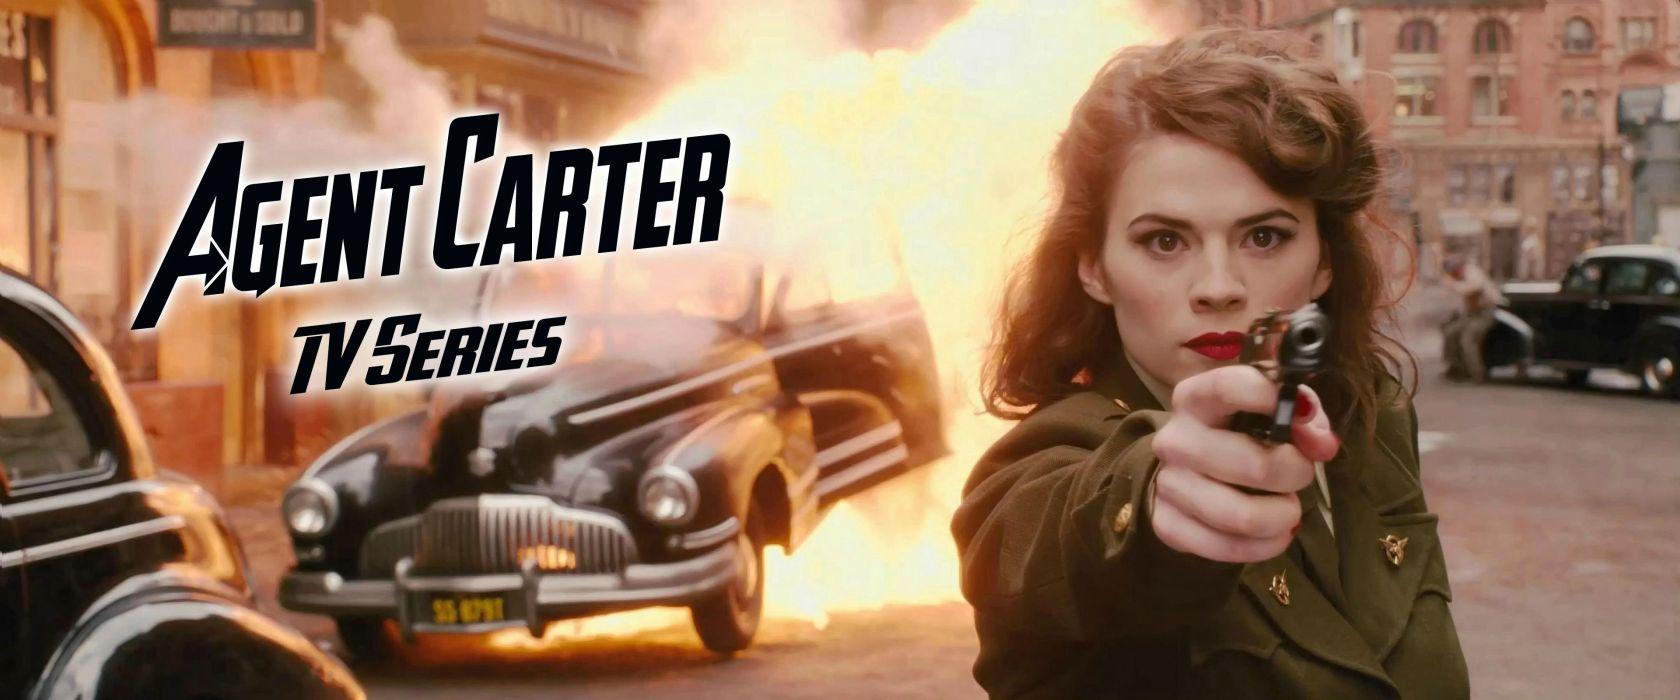 MARVEL AGENT CARTER superhero hero series action adventure drama sci-fi 1agentcarter crime captain america poster weapon gun pistol fire wallpaper